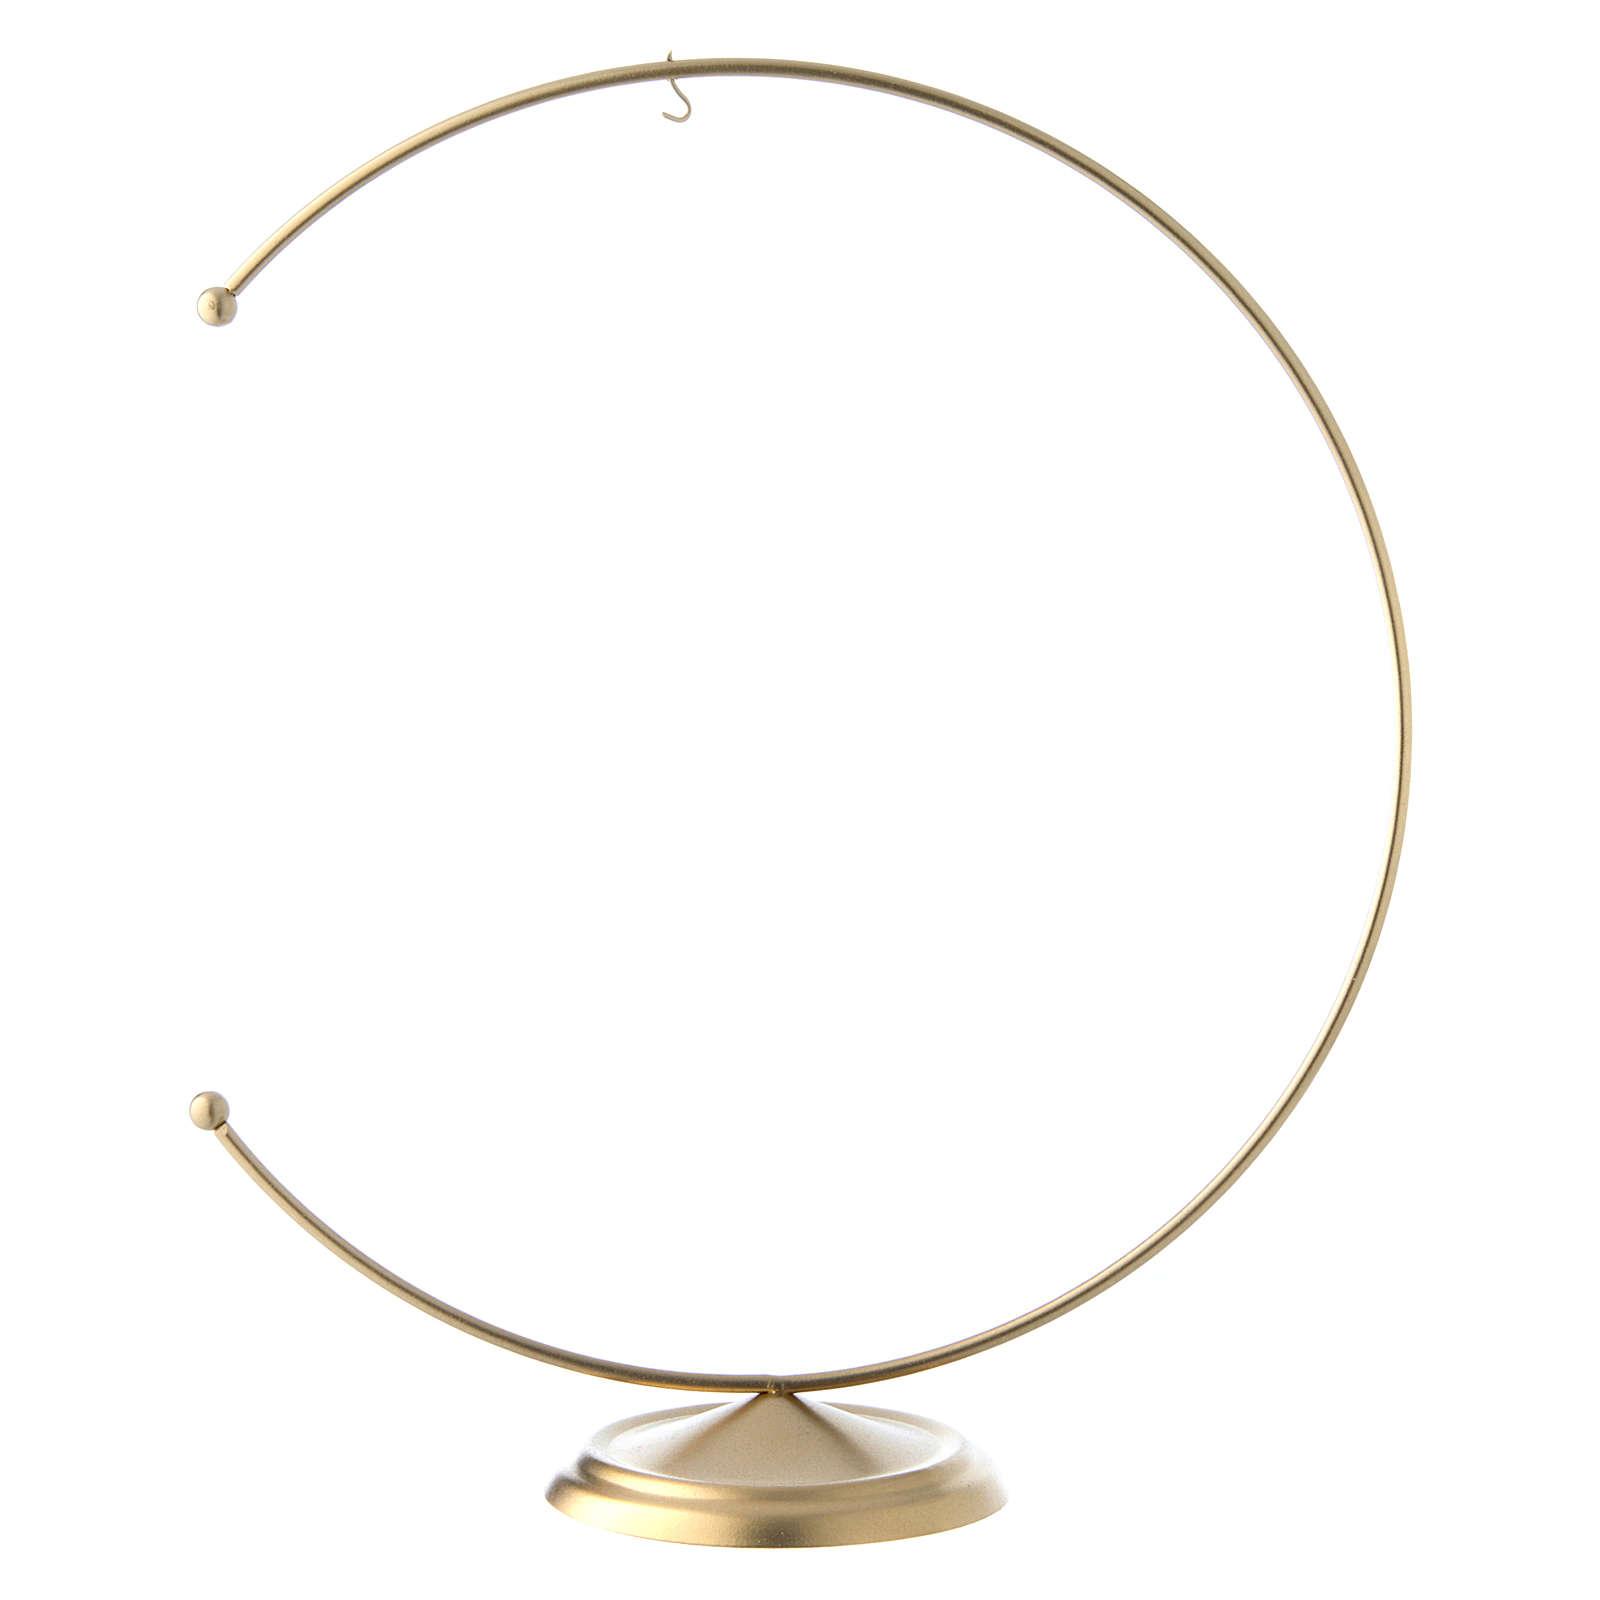 Christmas bauble hook in gold metal 200 mm 4